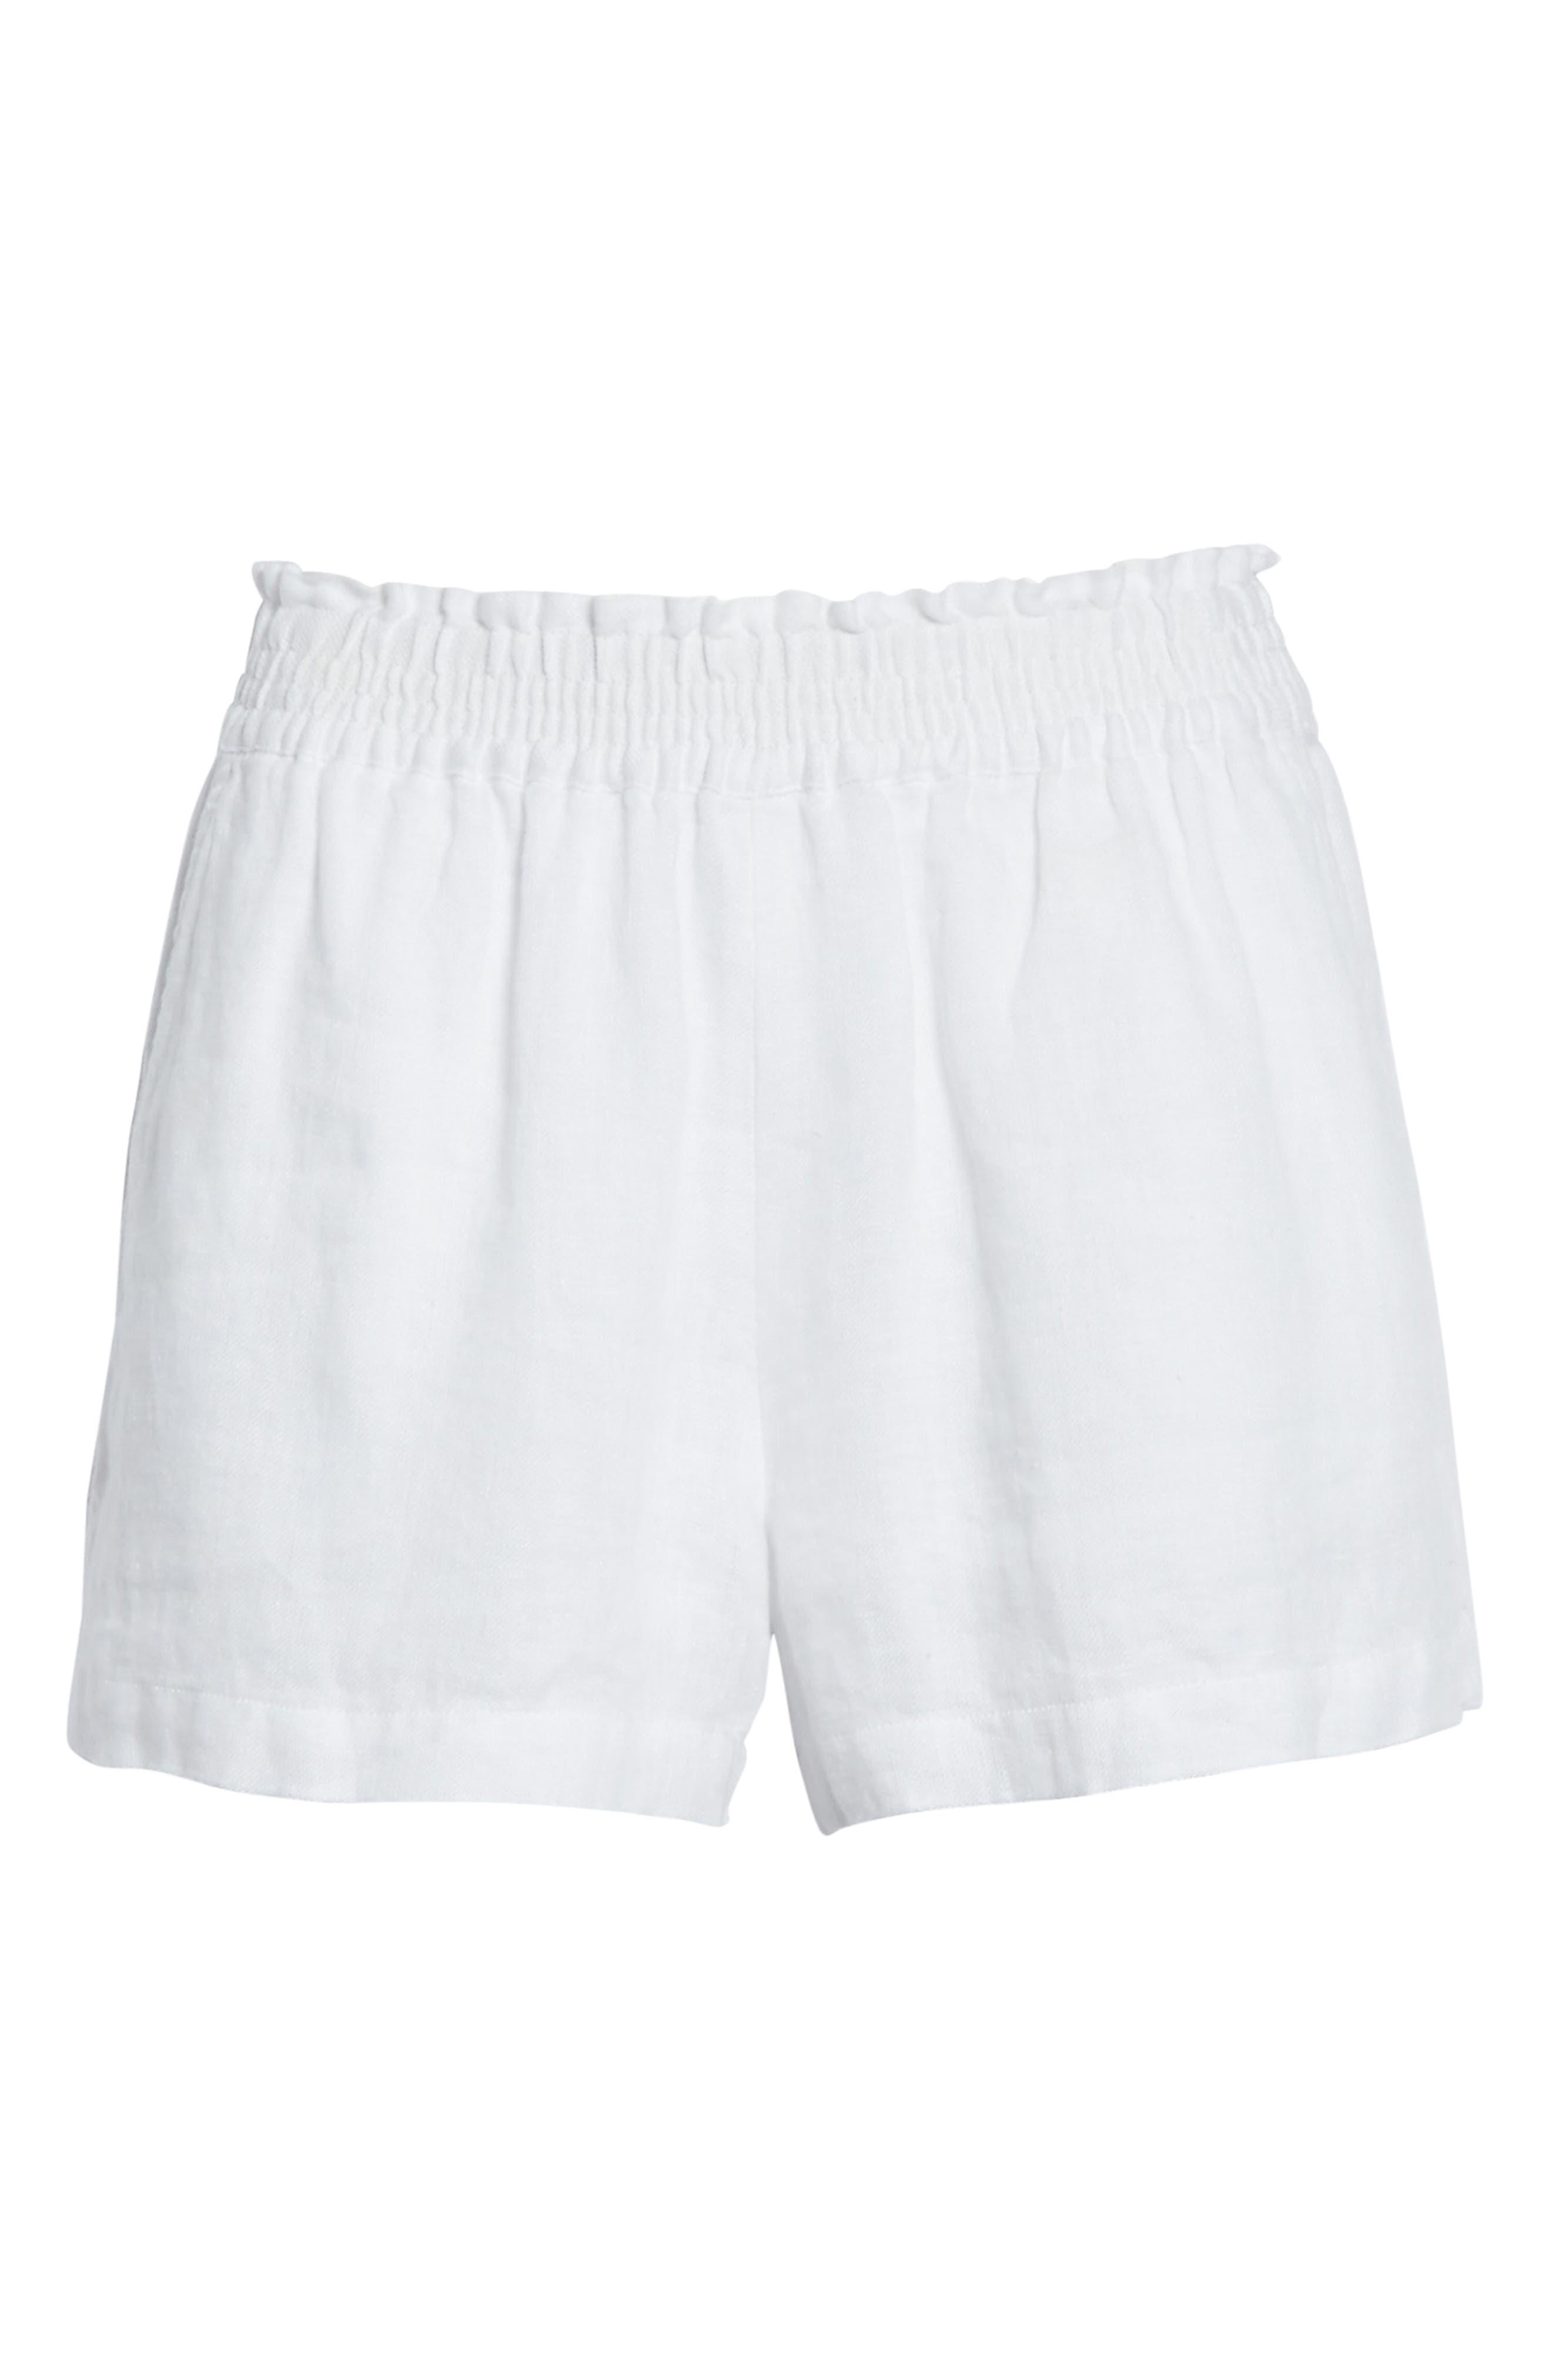 Fenna Linen Shorts,                             Alternate thumbnail 6, color,